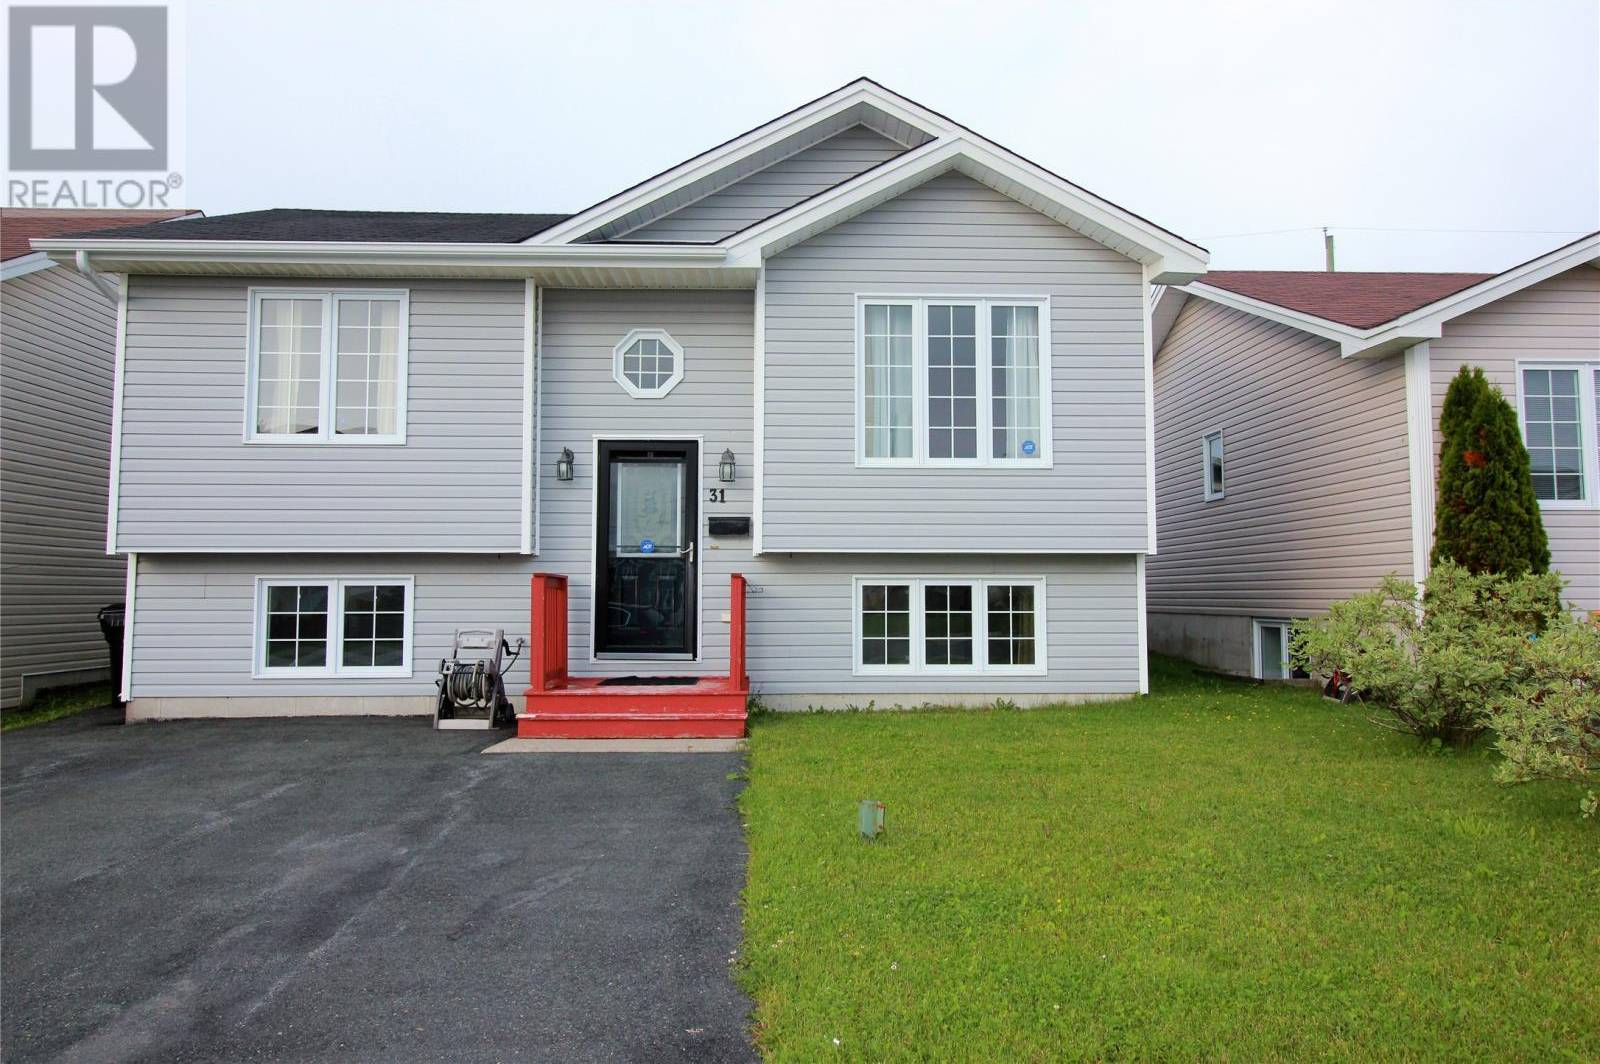 House for sale at 31 Long Beach St St. John's Newfoundland - MLS: 1200178